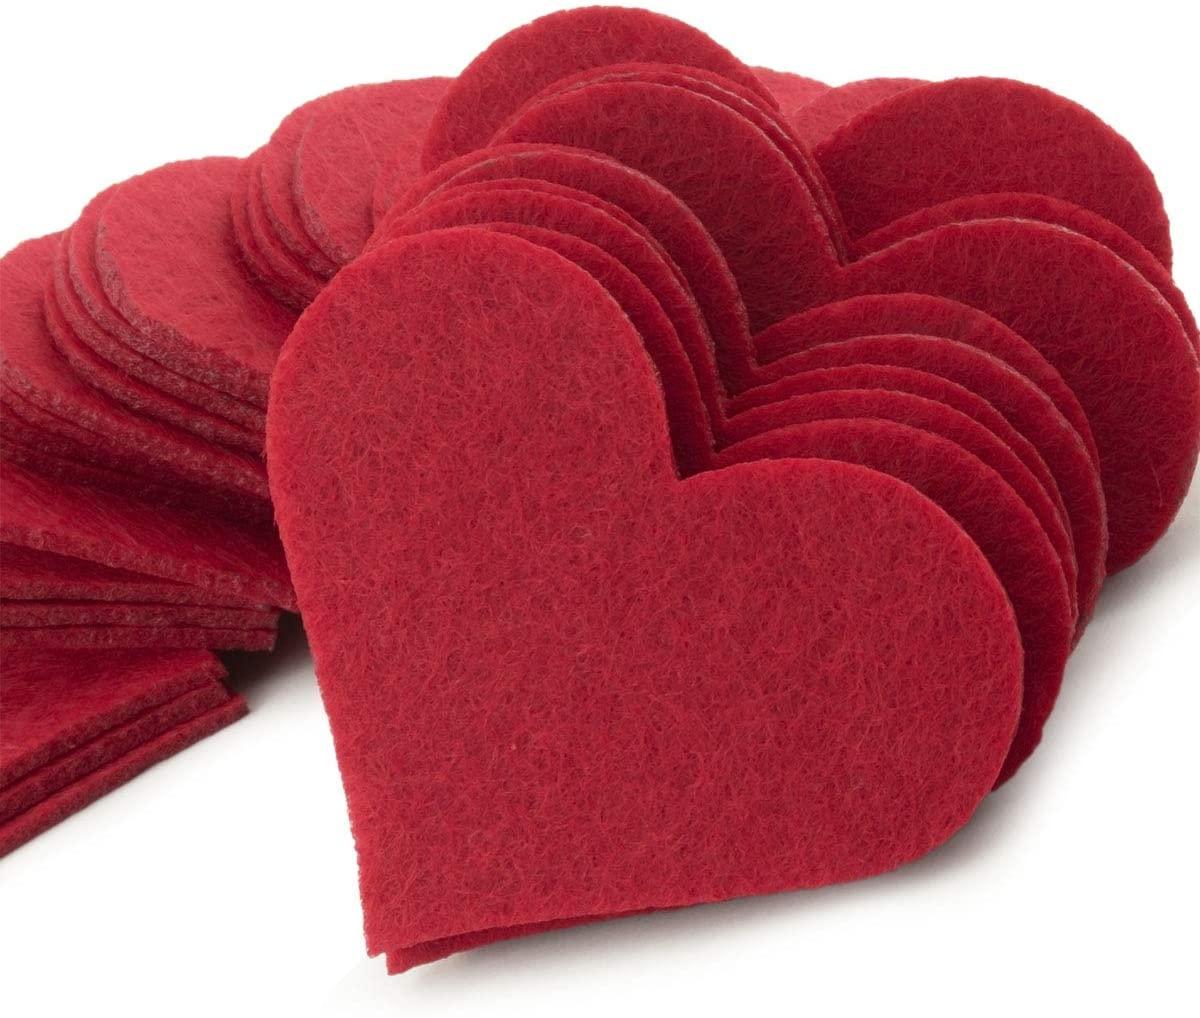 Summer-Ray 100 Red Felt Heart Laser Cutout Scrapbooking Embellishment in 2mm Felt